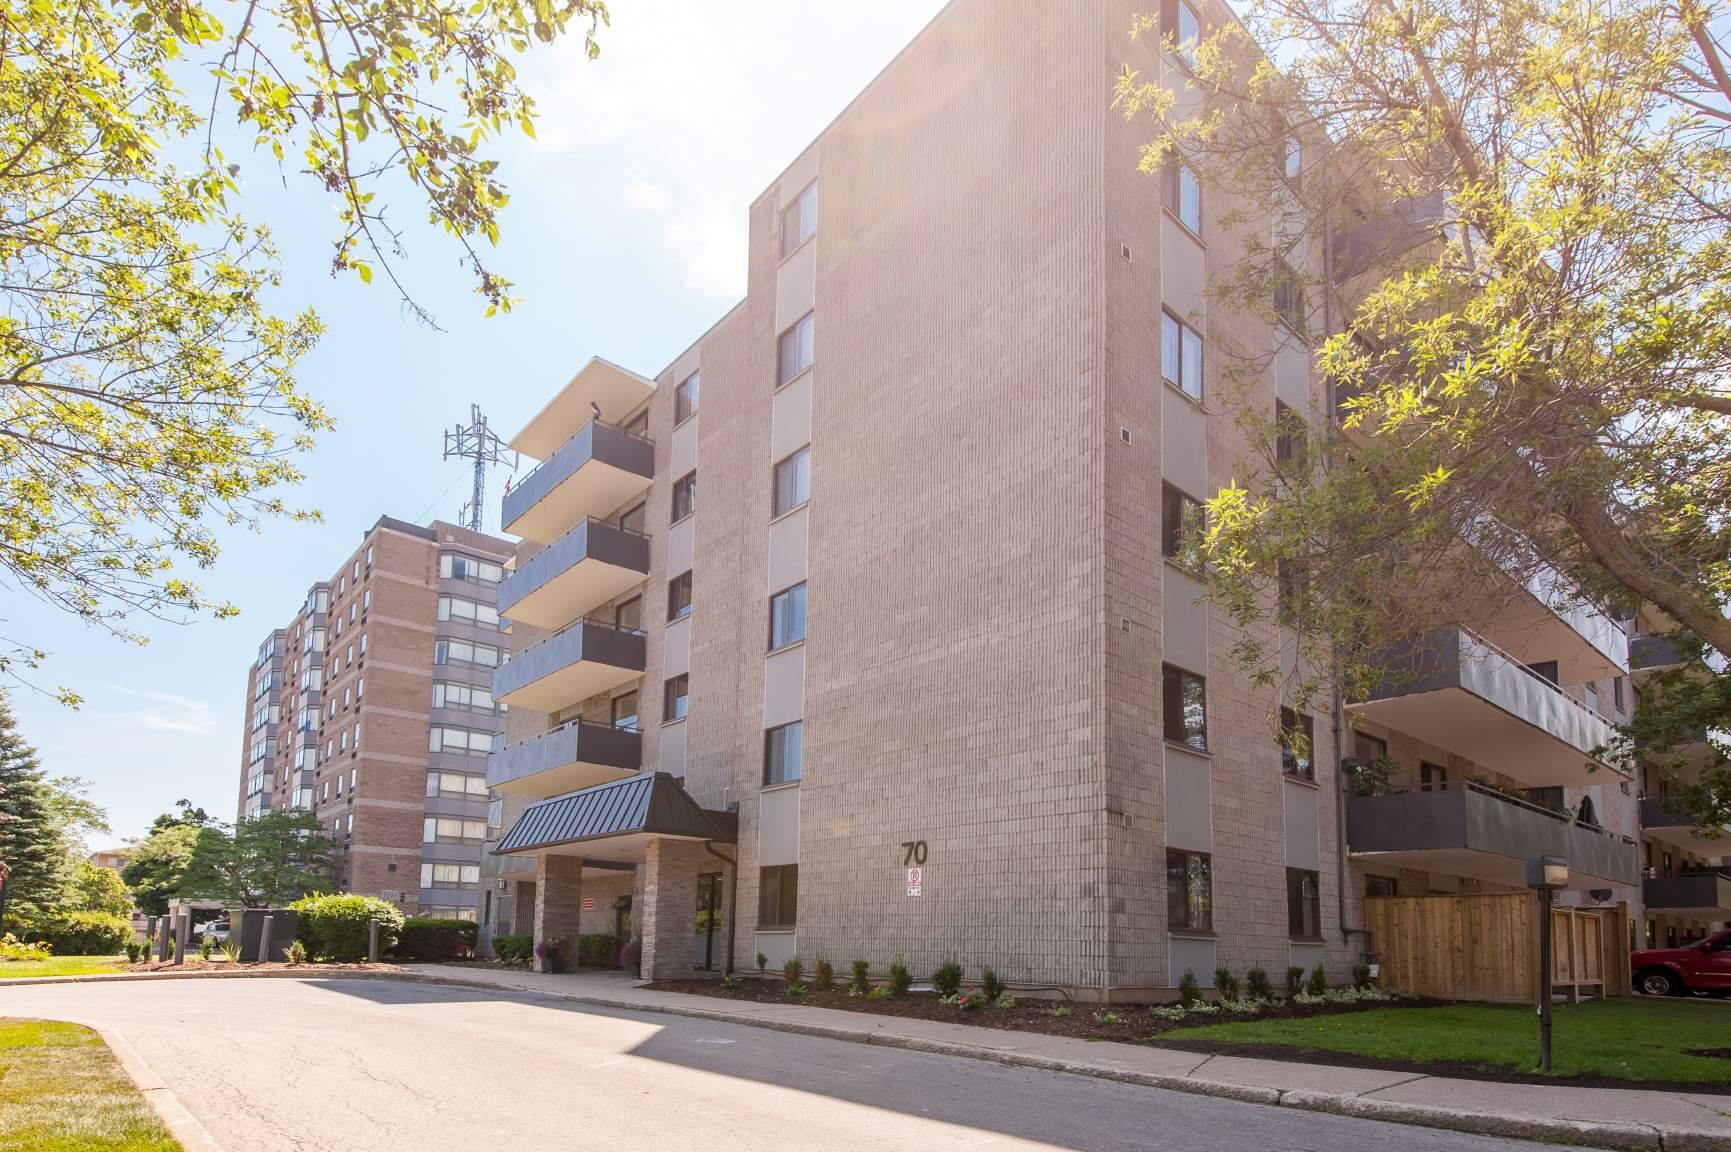 St Catharines Ontario Apartments Maplebrook Apartments